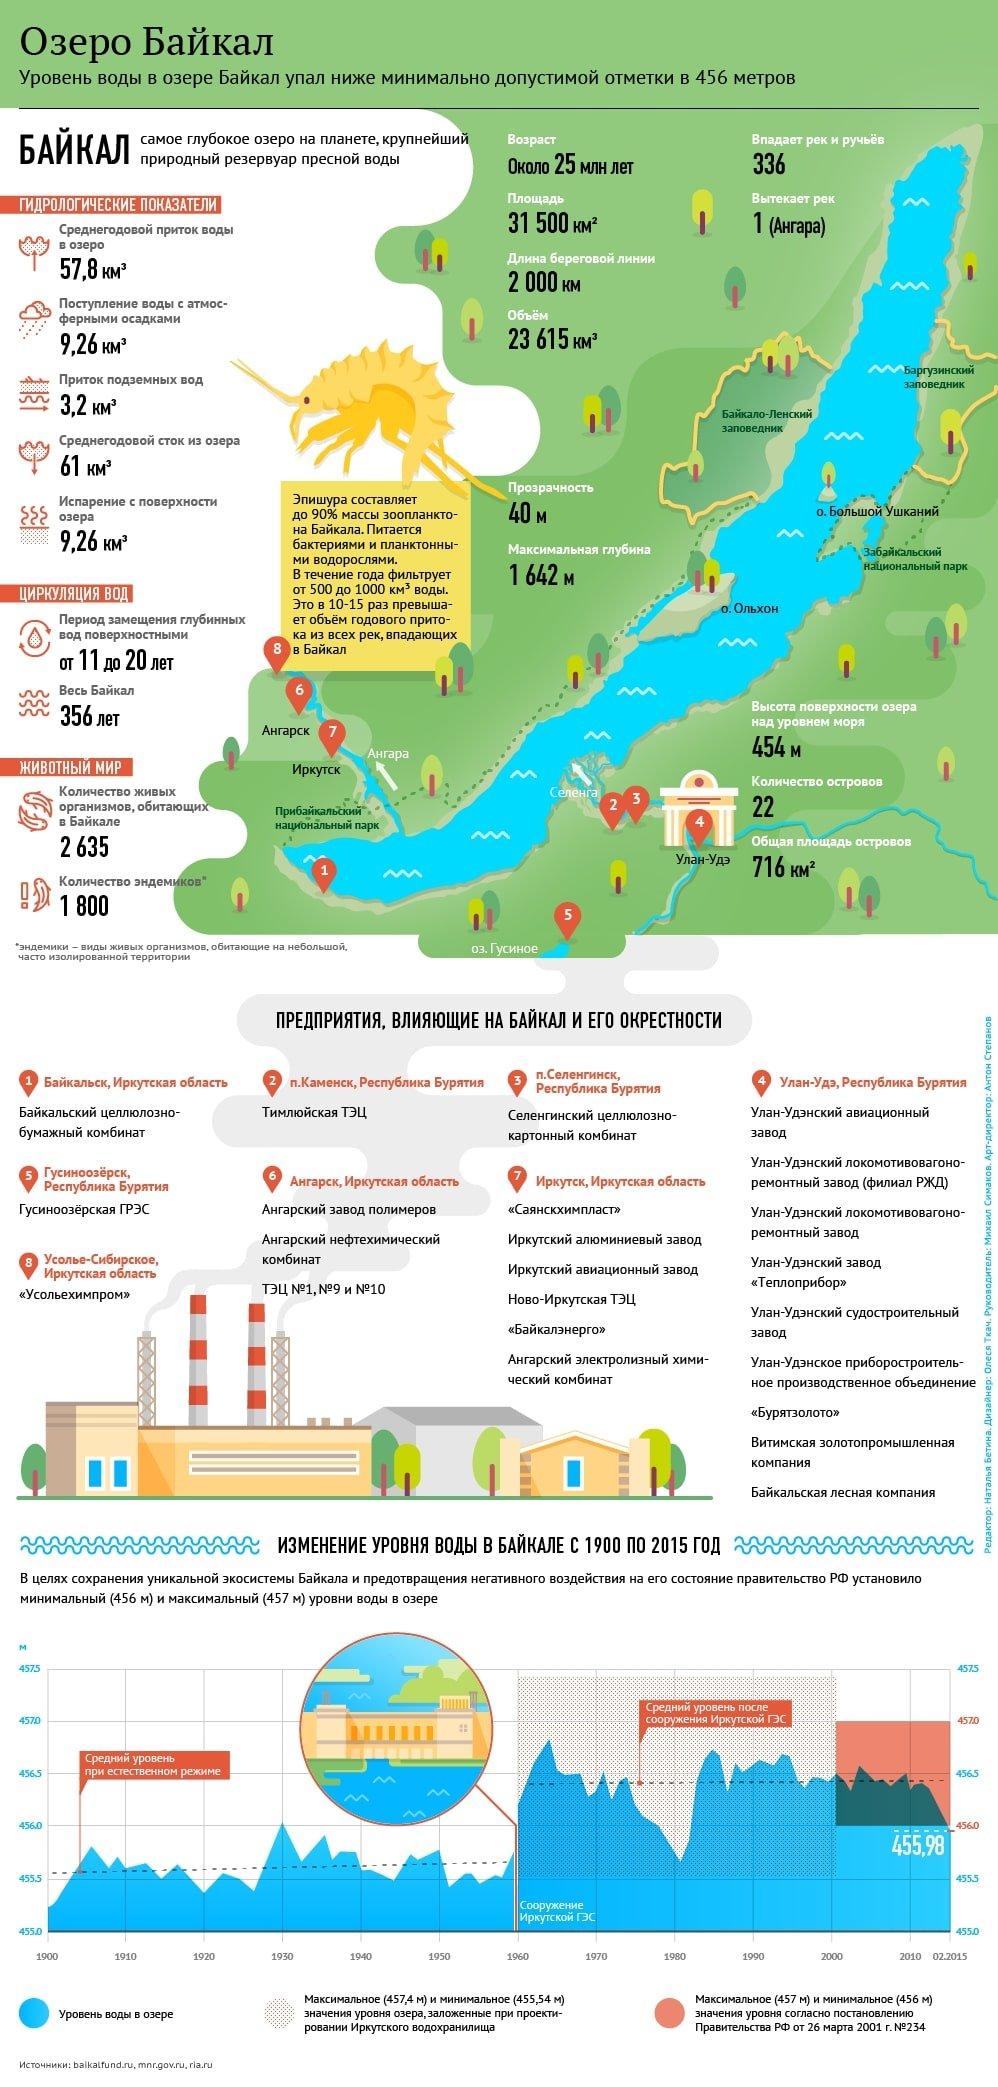 инфографика о Байкале